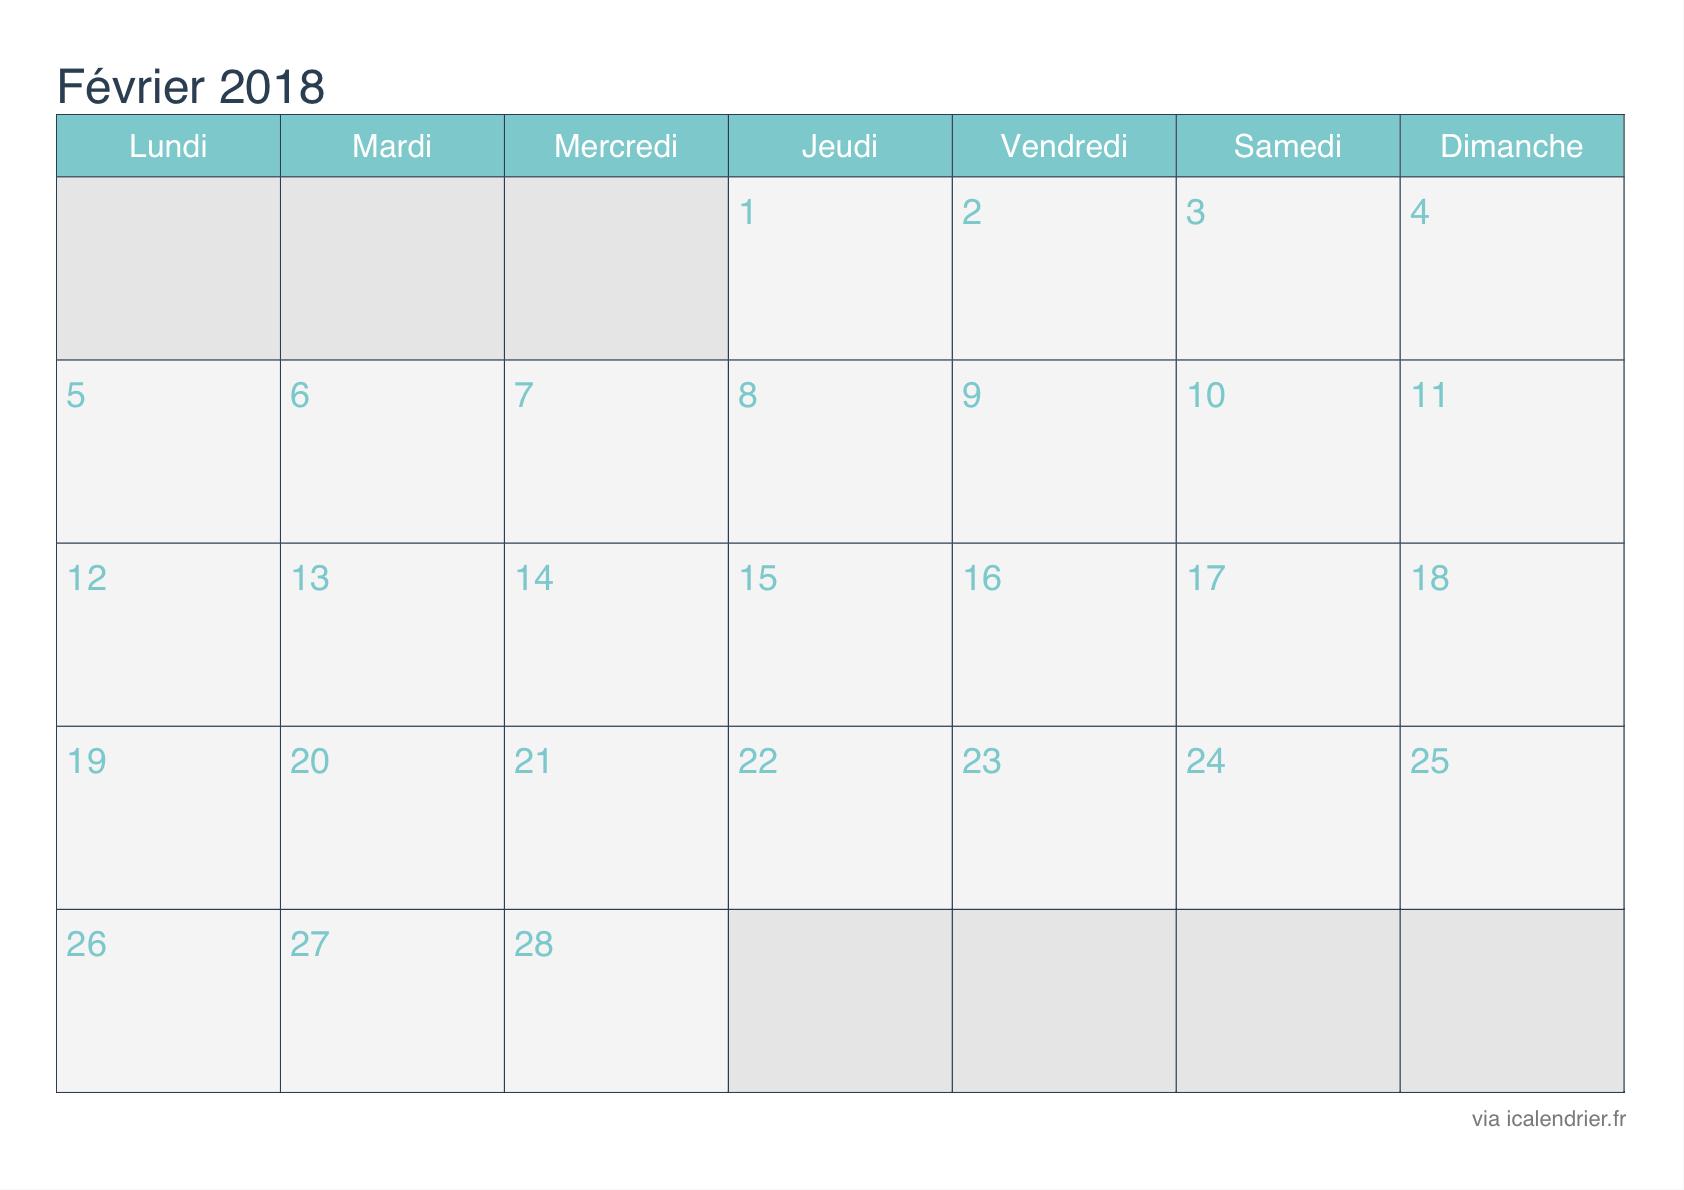 Calendrier Février 2018 À Imprimer - Icalendrier serapportantà Calendrier Mensuel 2018 À Imprimer